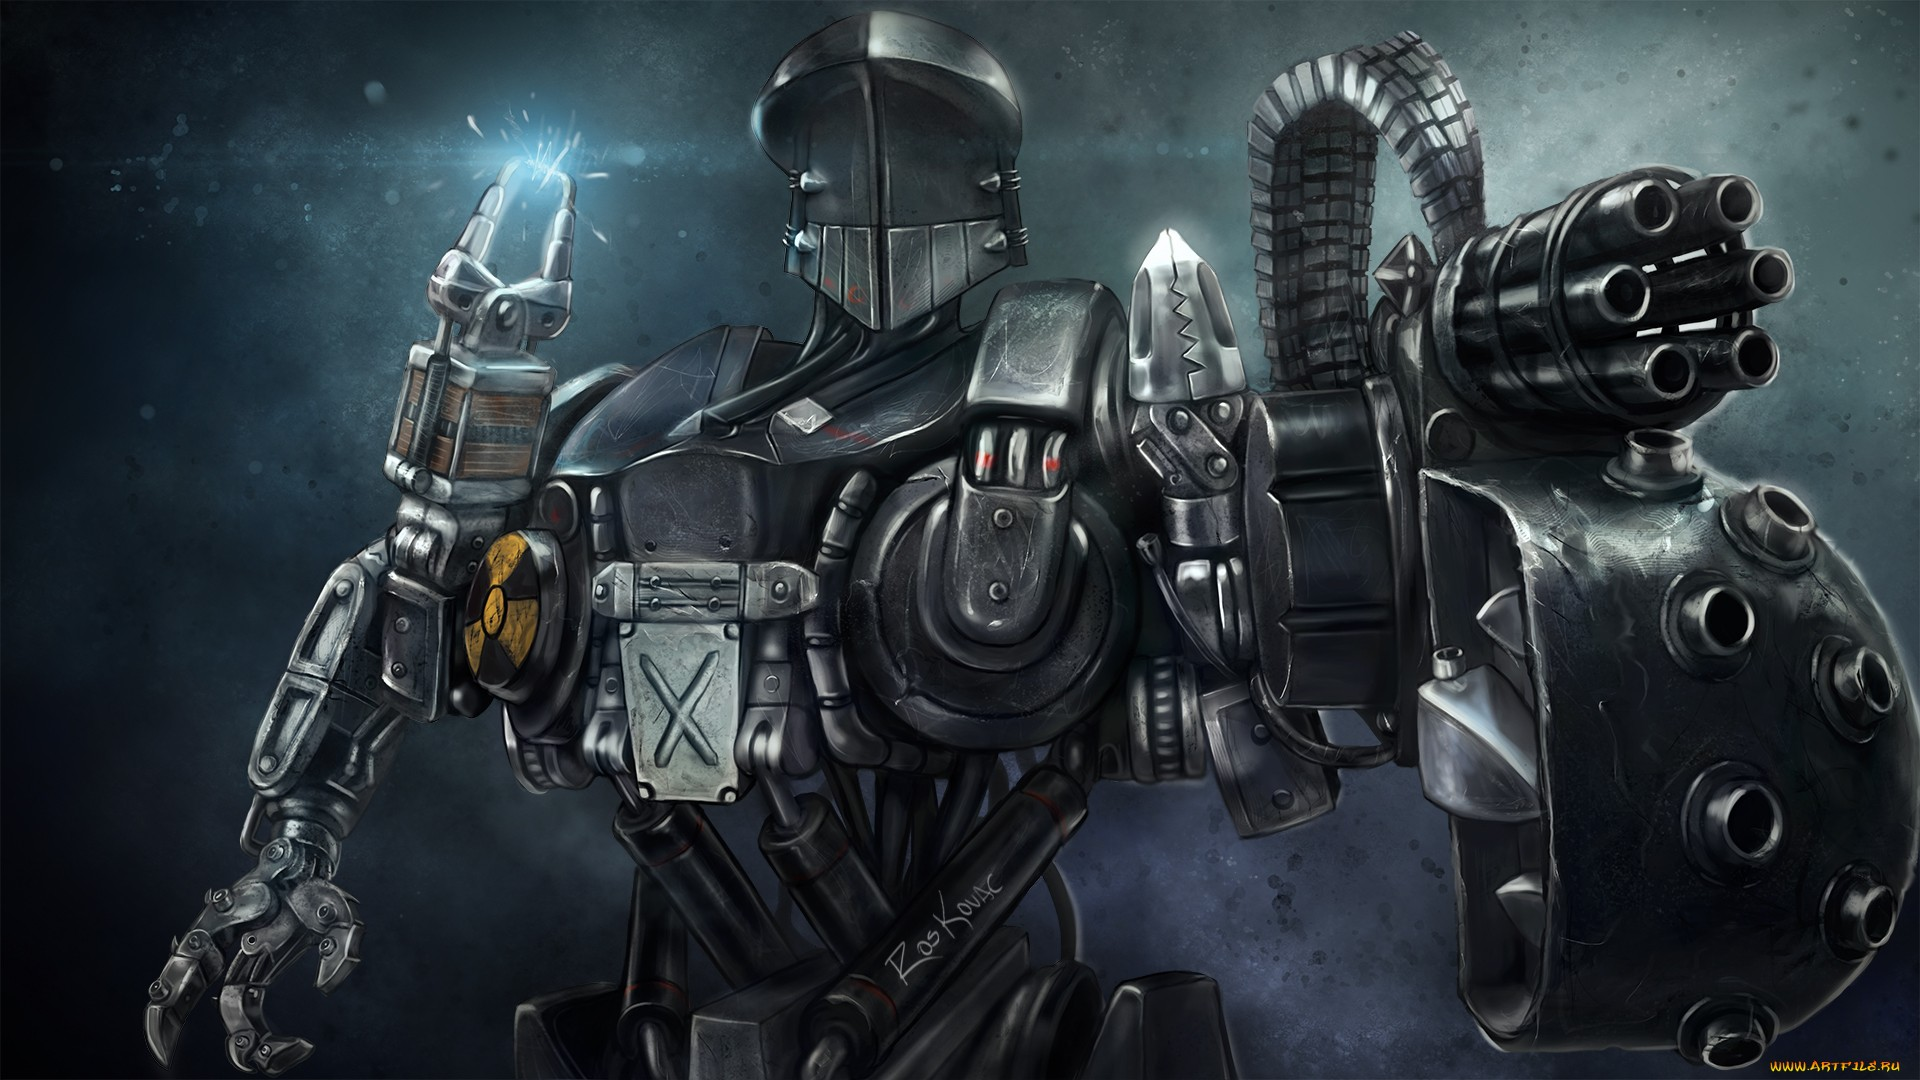 Retro Robot Wallpaper & Backgrounds